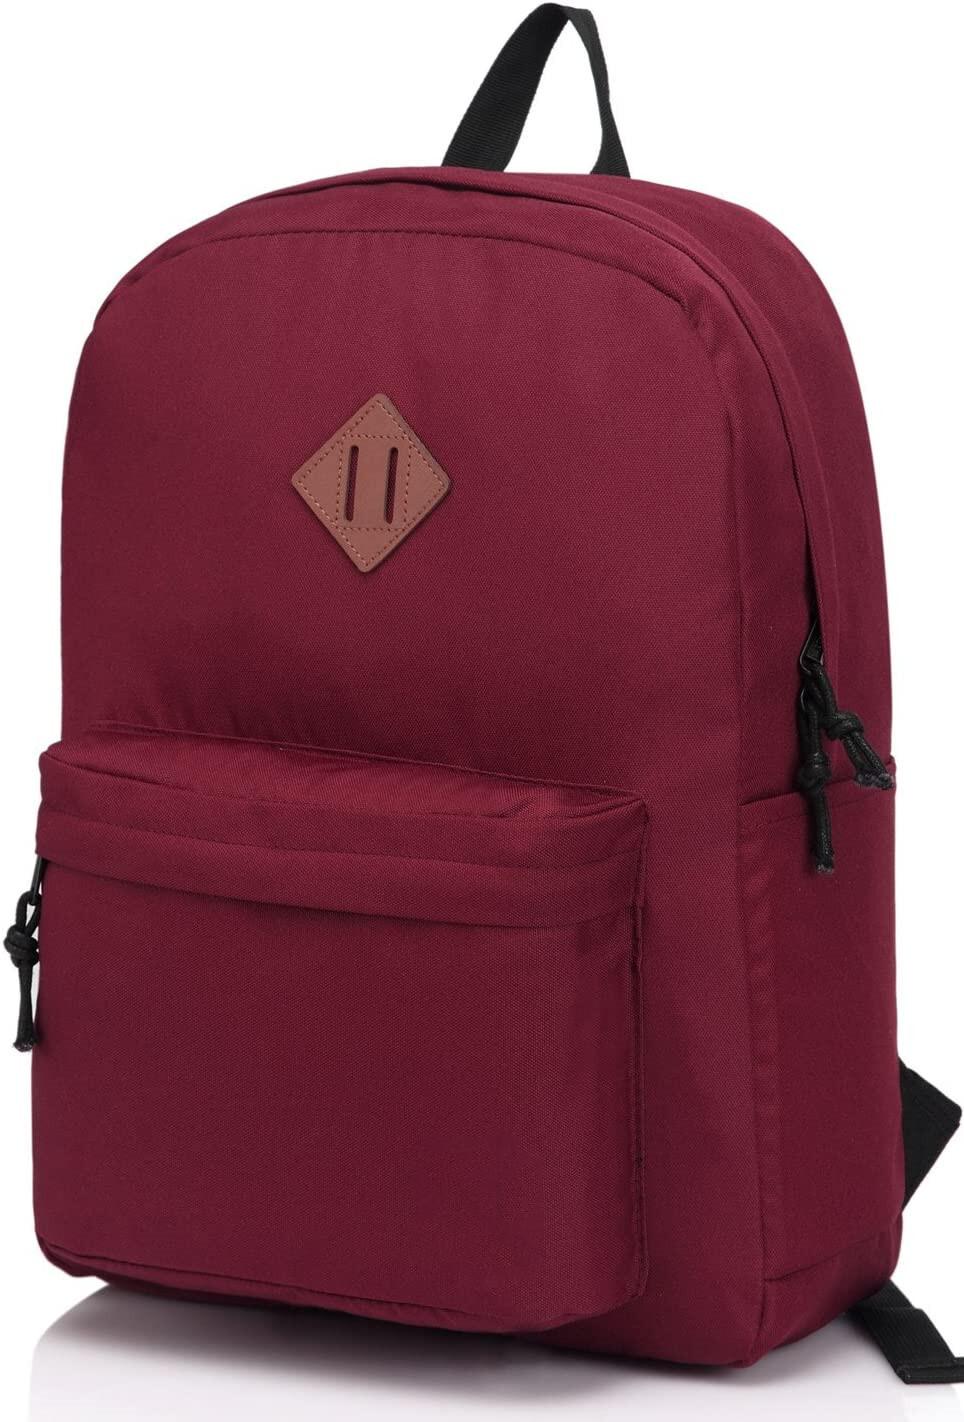 fashion bag waterproof school backpacks for teenagers